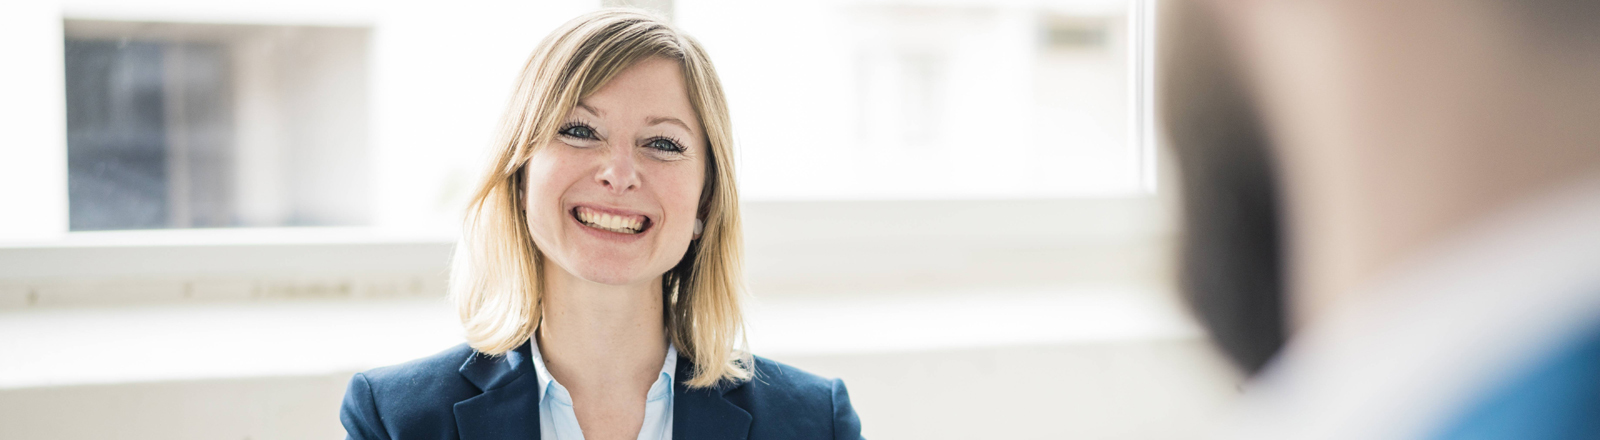 Frau beim Bewerbungsgespräch lächelt sehr selbstbewusst